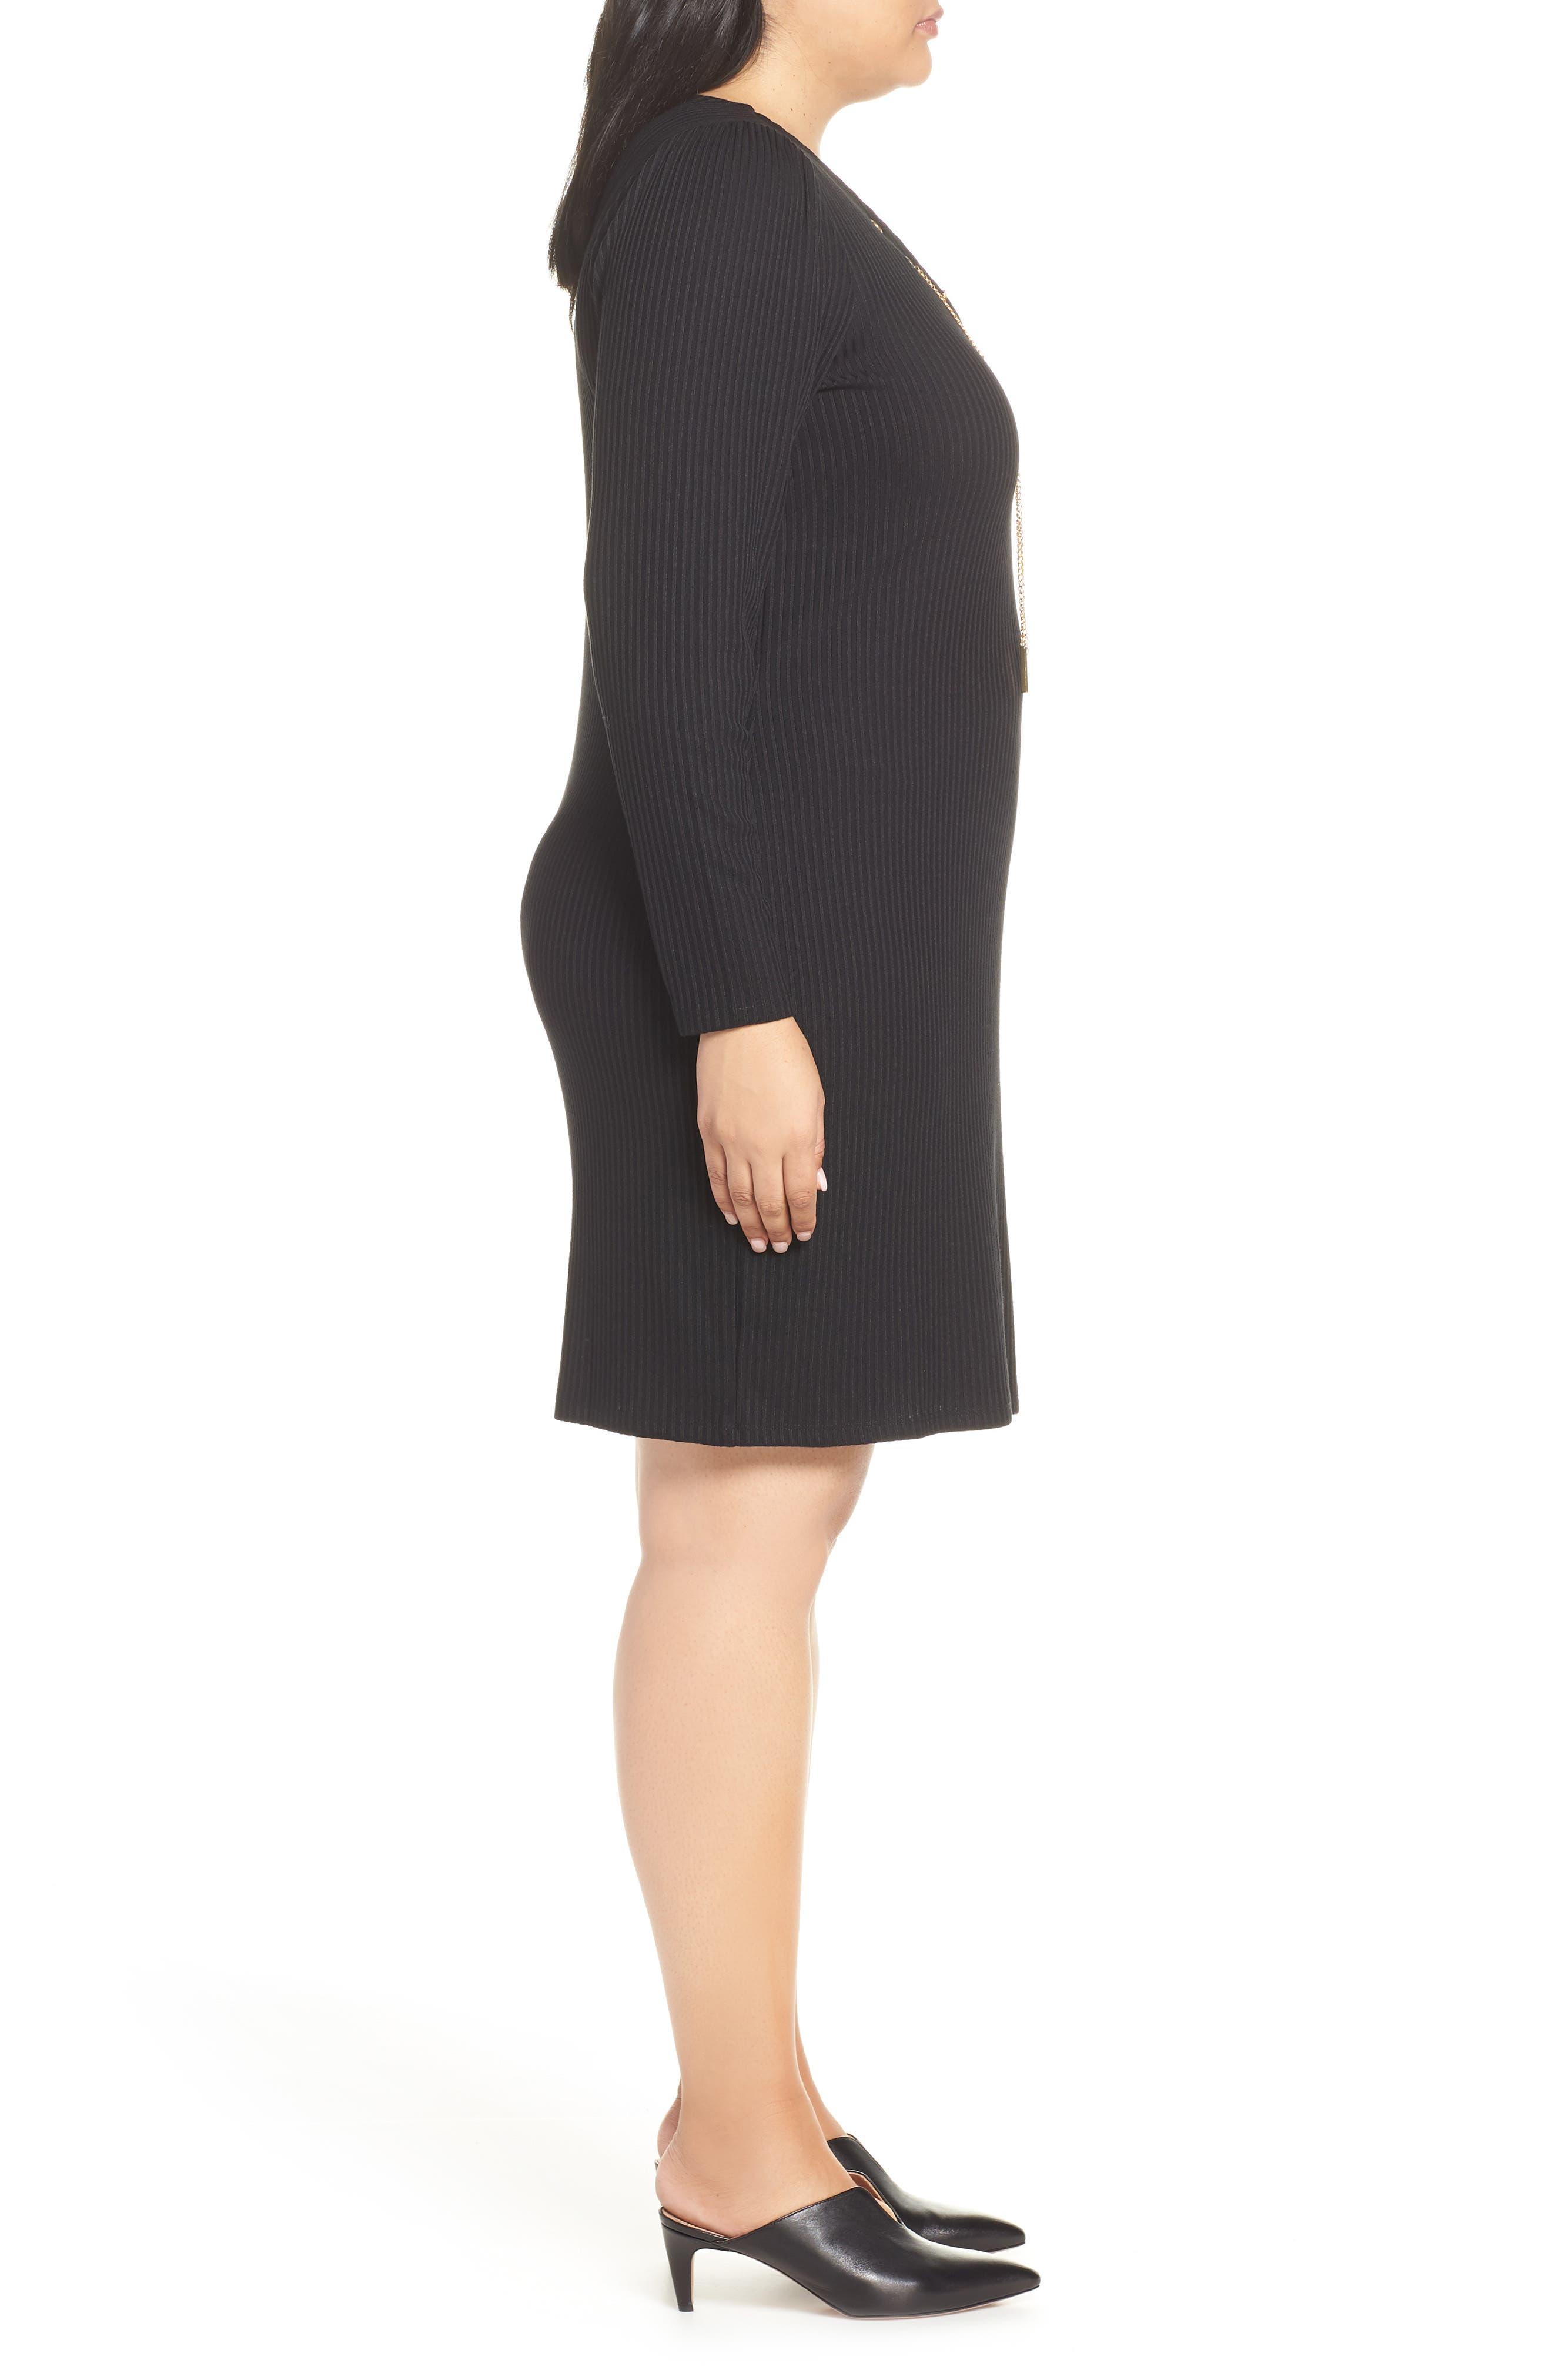 MICHAEL MICHAEL KORS, Chain Lace-Up V-Neck Sweater Dress, Alternate thumbnail 4, color, 001